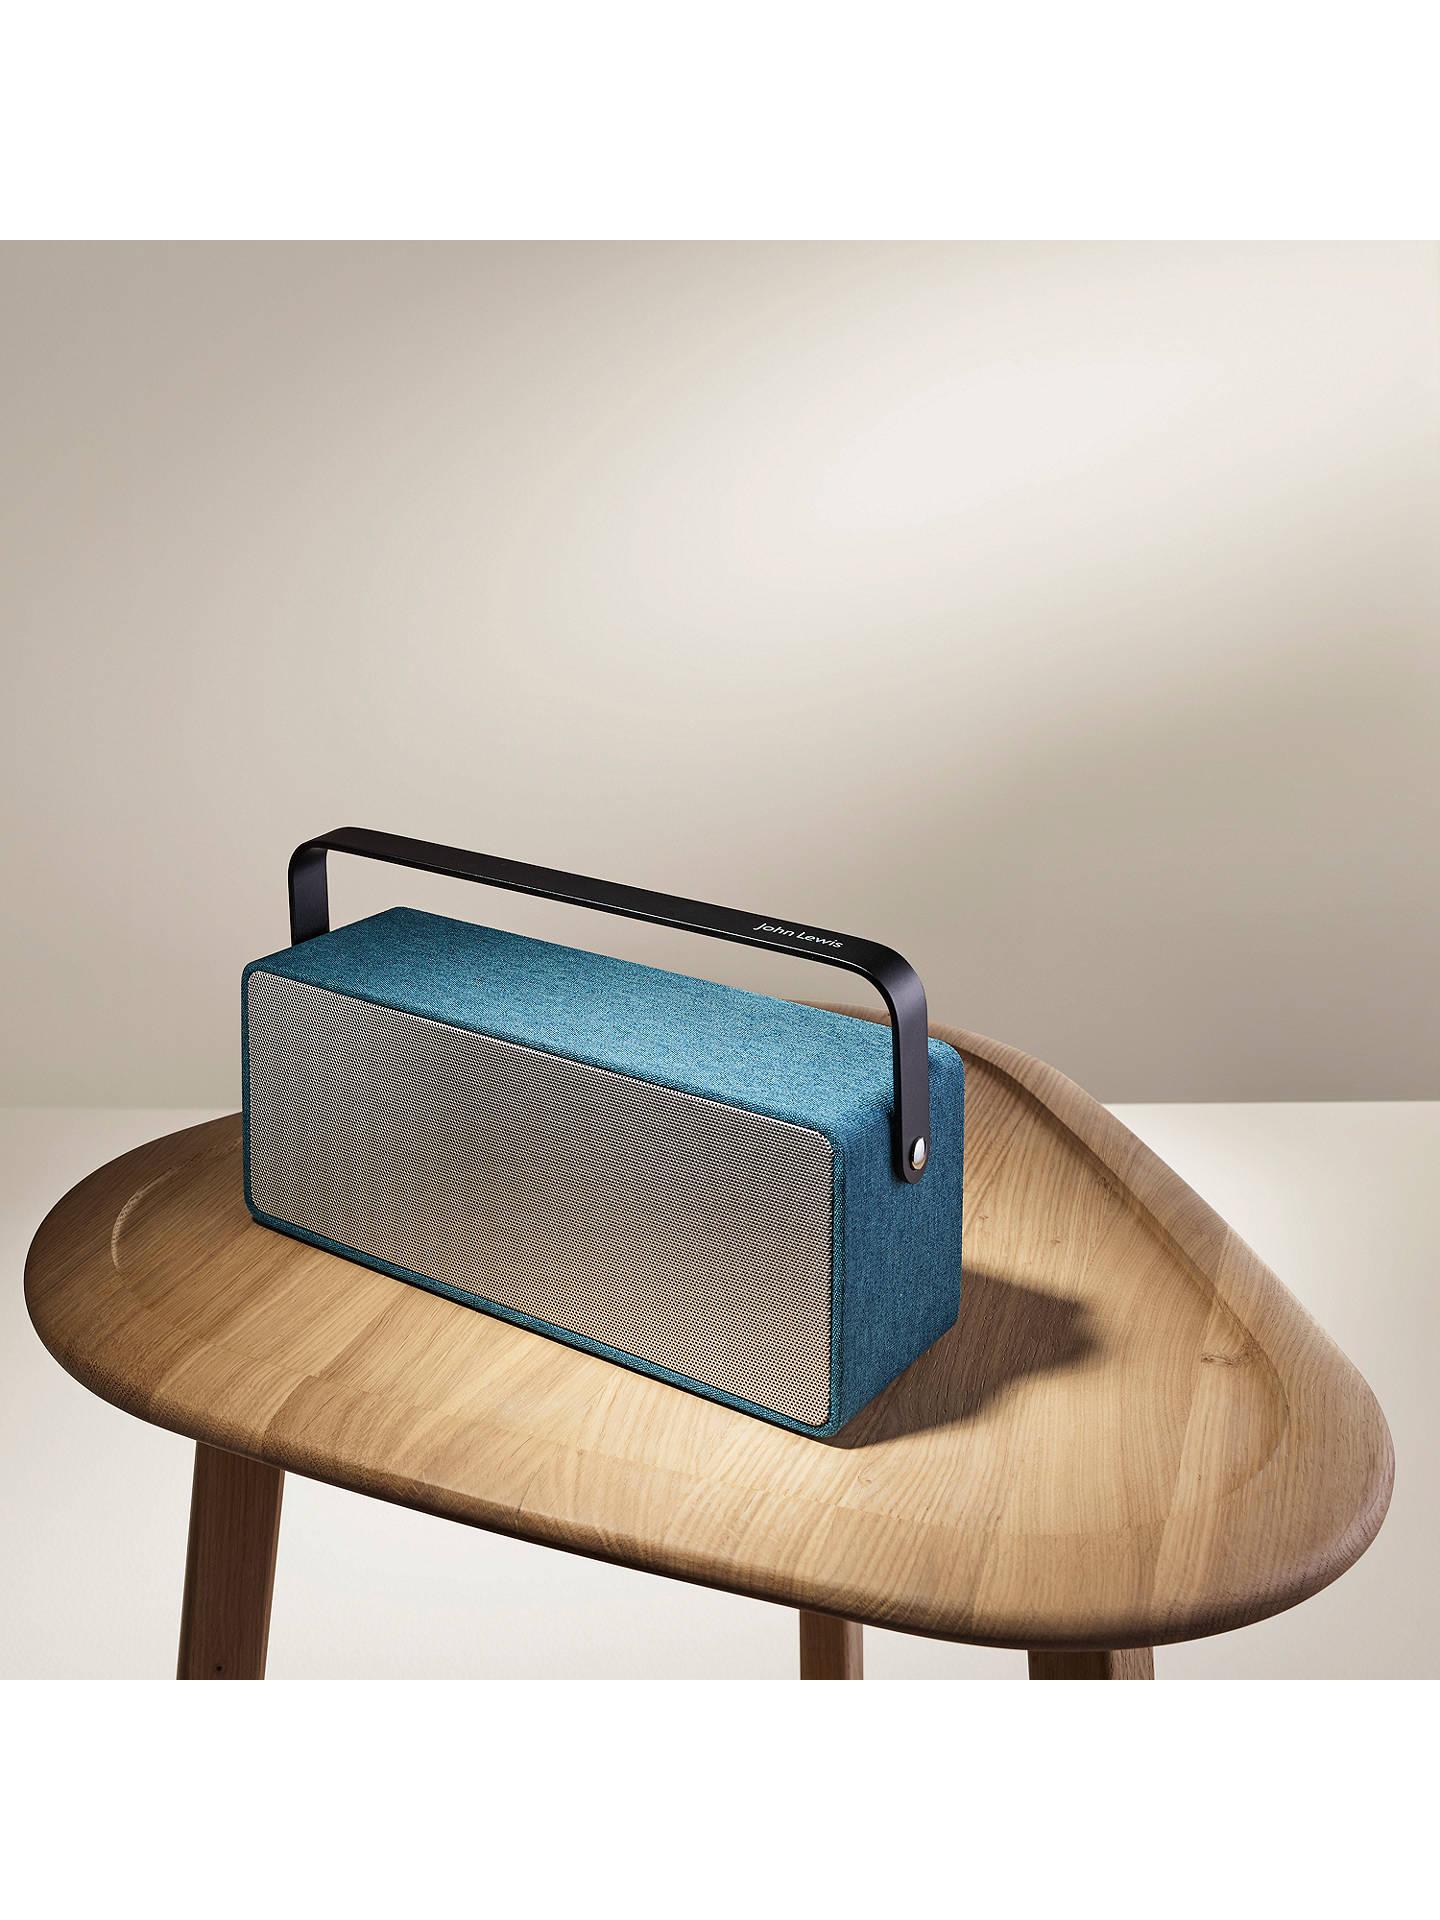 John Lewis & Partners Polka Portable Bluetooth Speaker, Teal